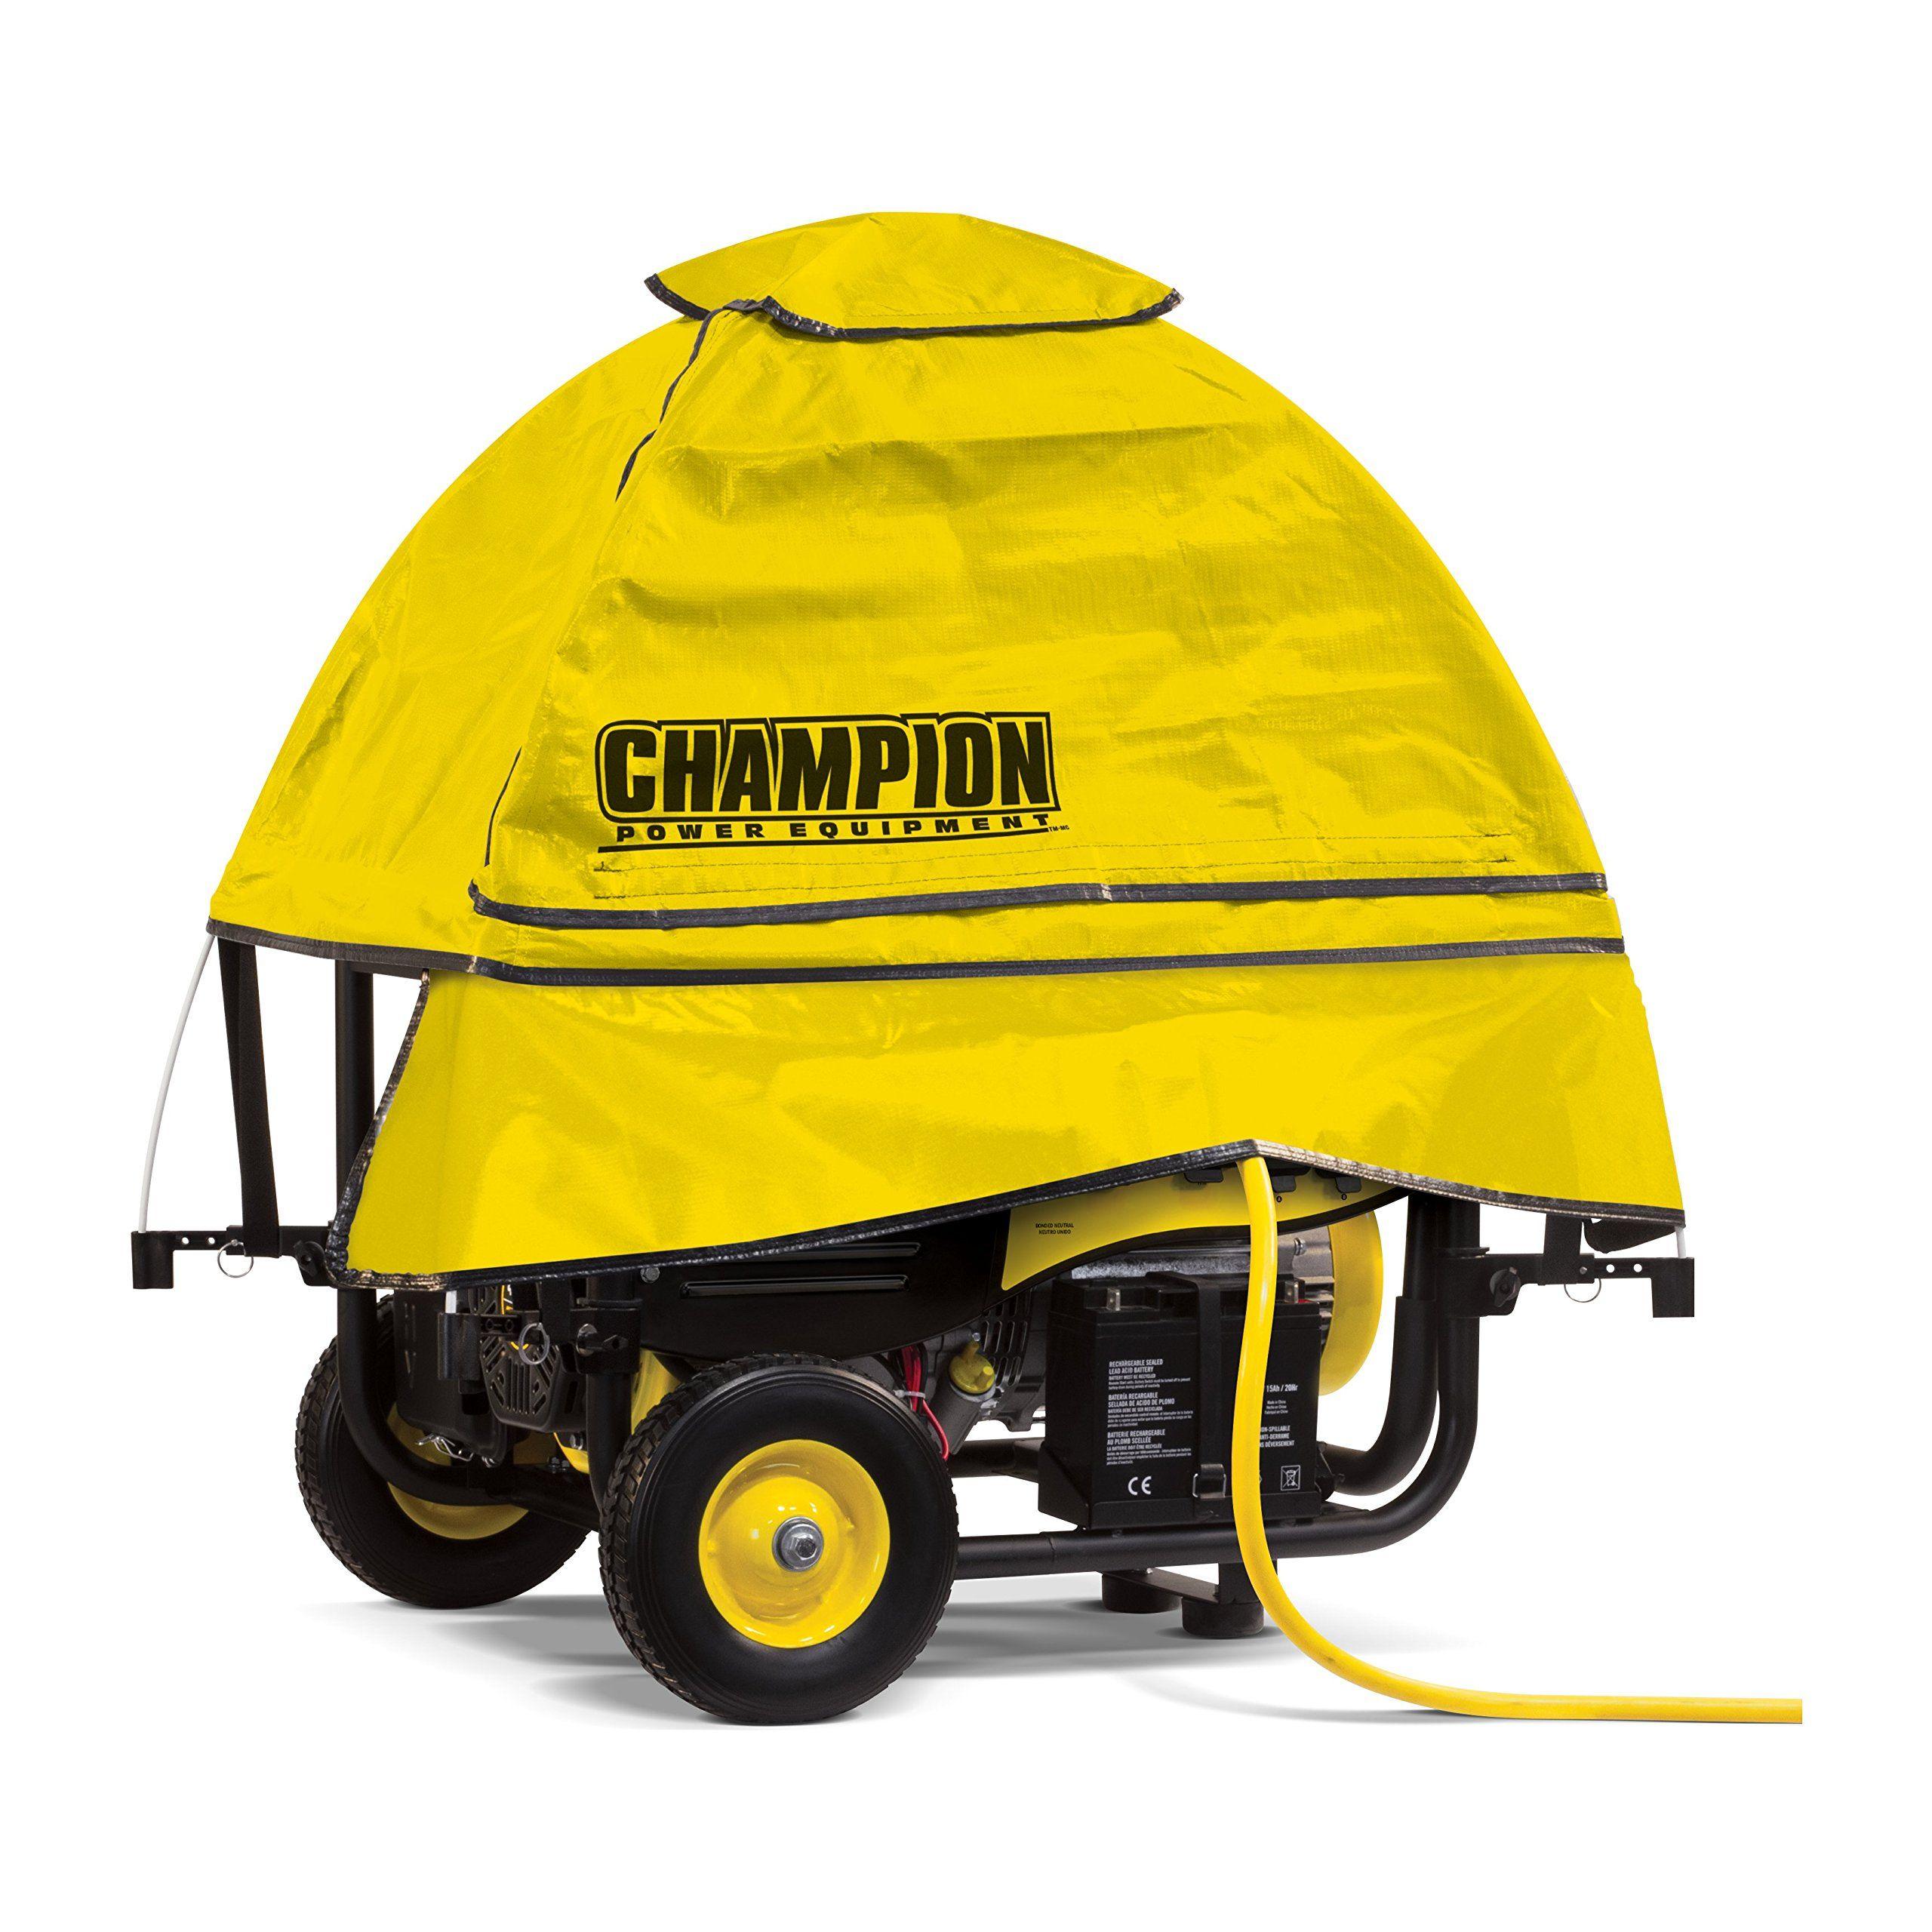 Champion storm shield severe weather portable generator